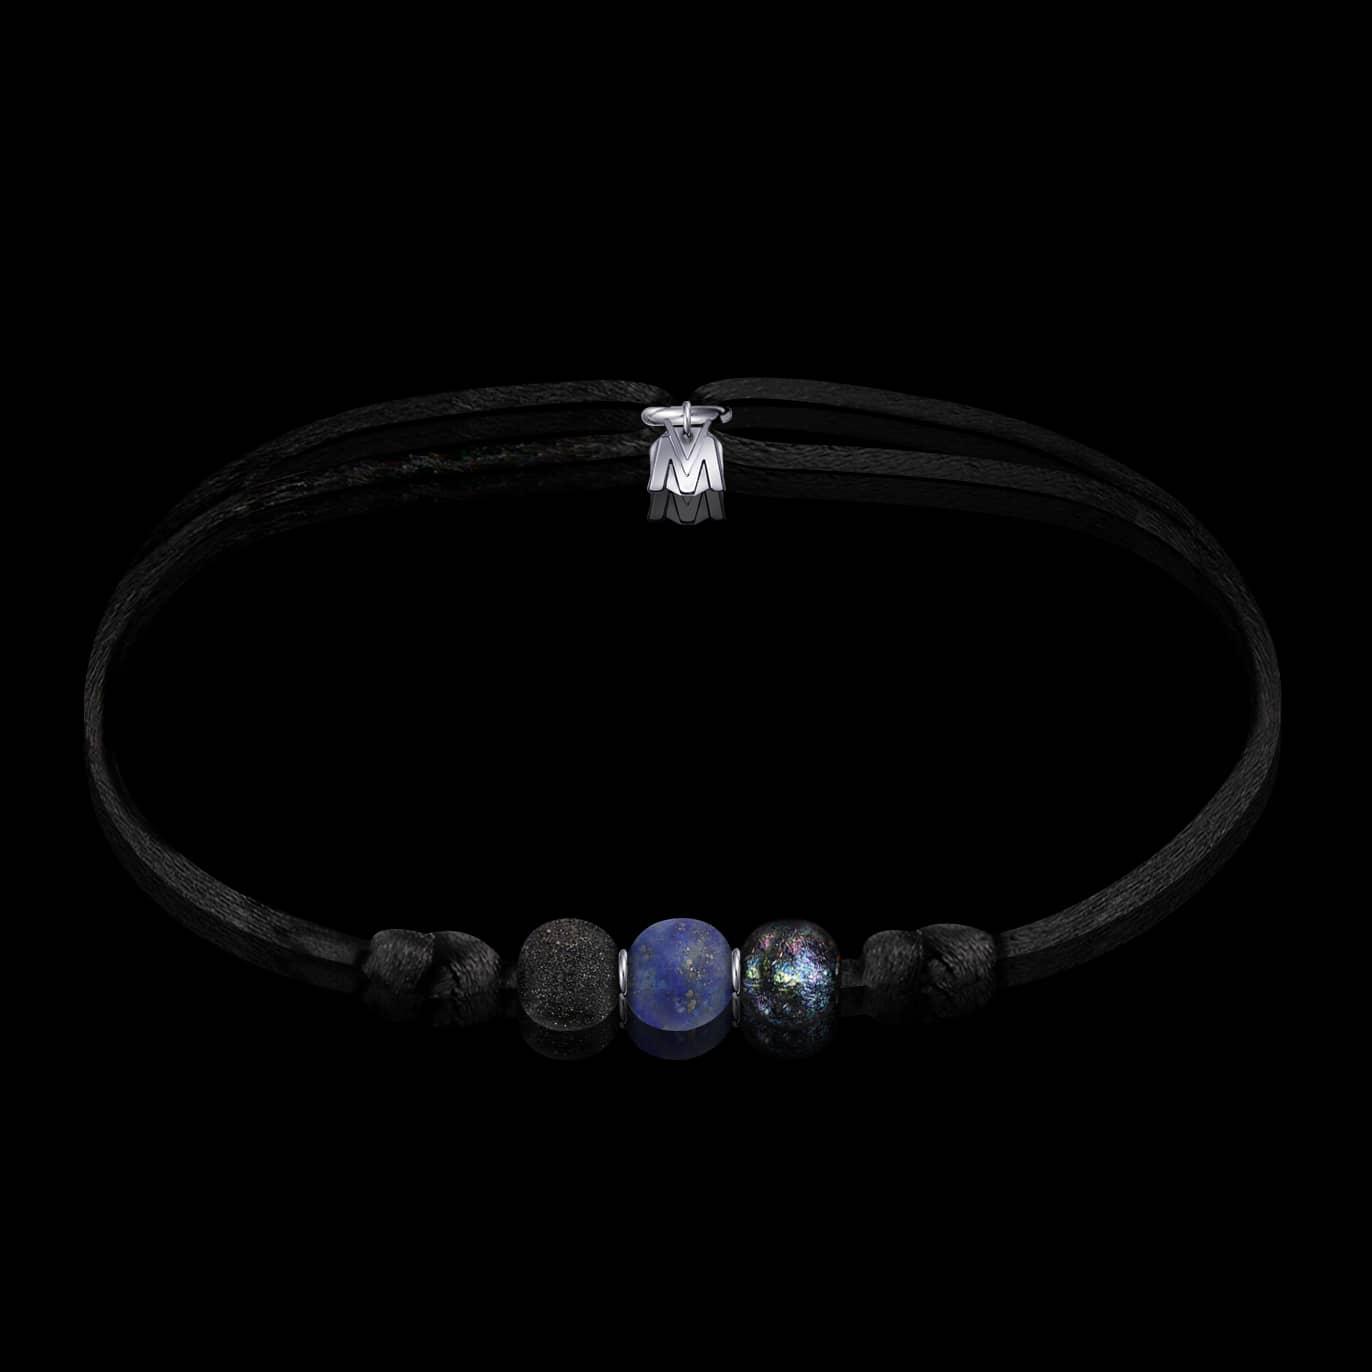 bracelet-lapis-lazuli-made-in-france-cordon